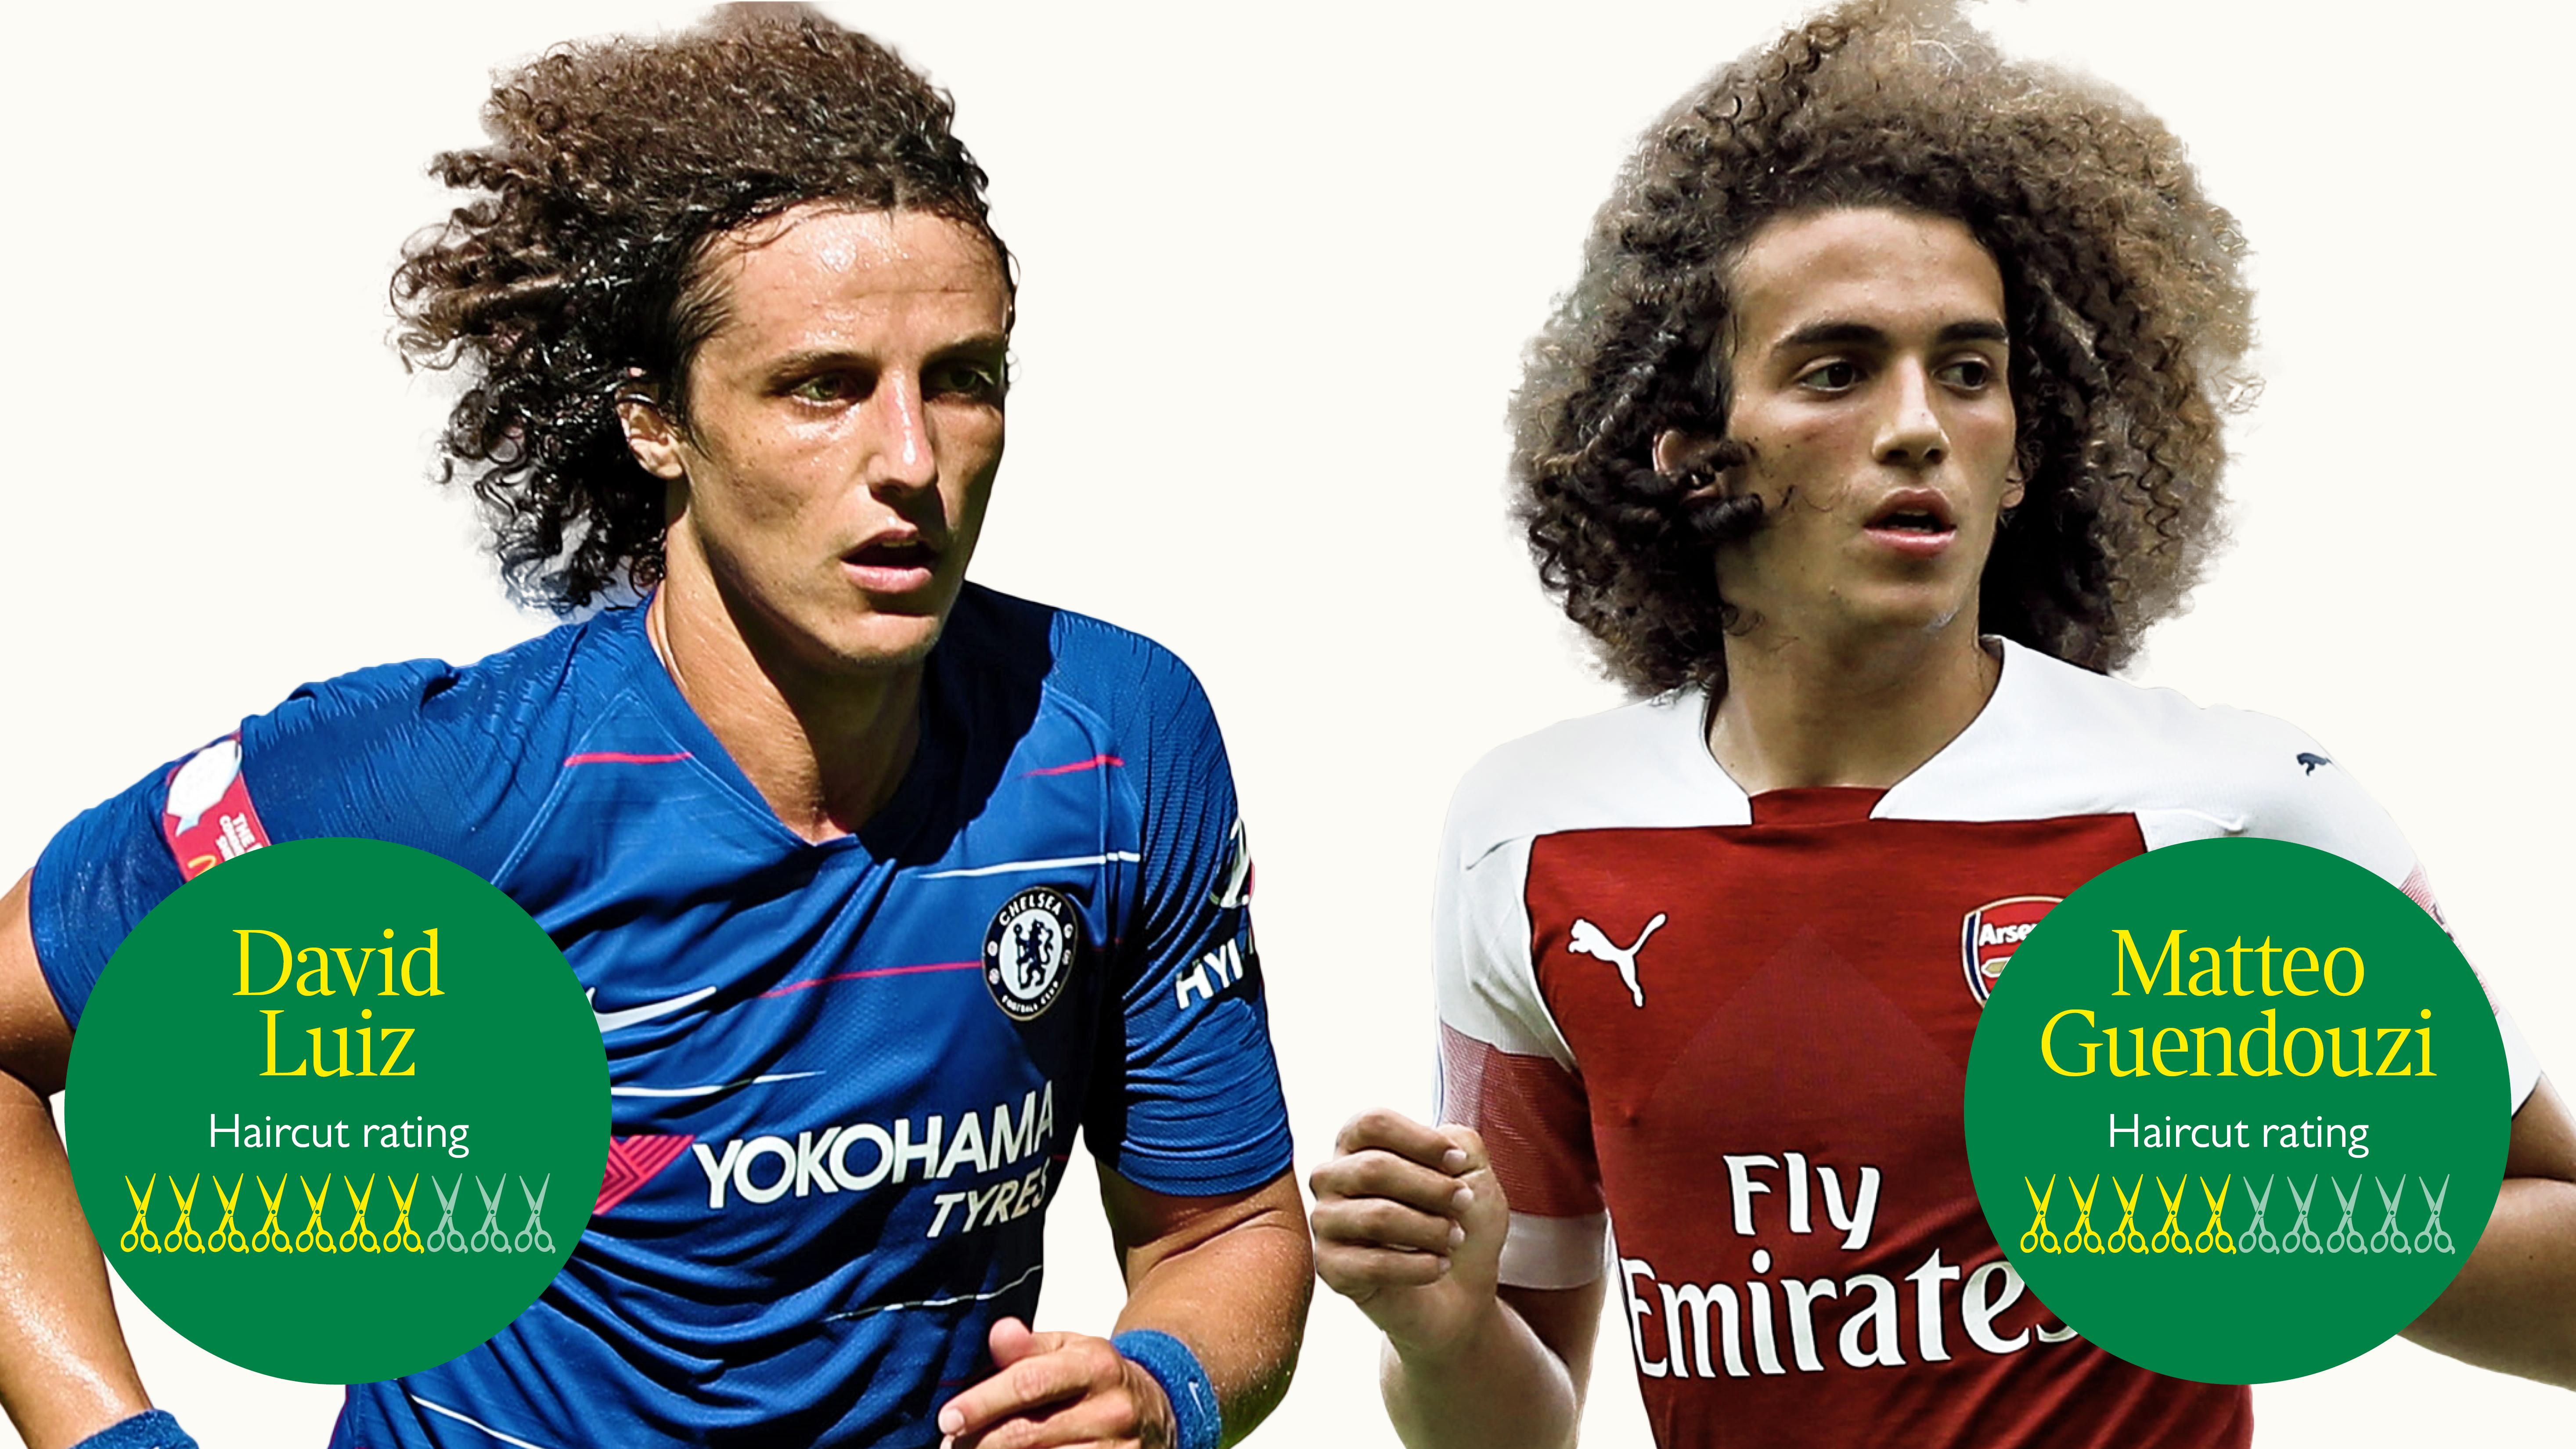 The big hair derby — David Luiz v Mattéo Guendouzi